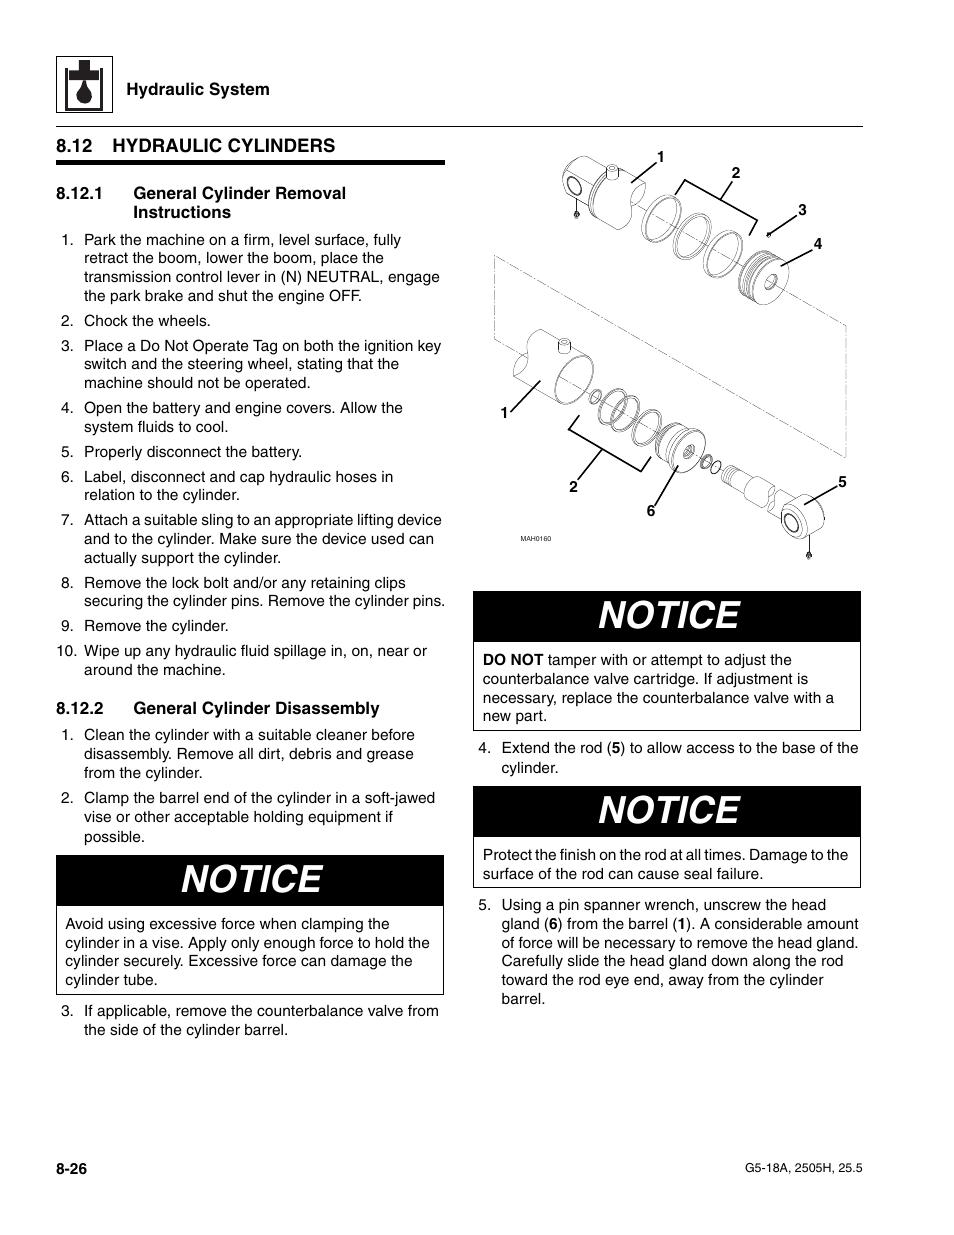 12 hydraulic cylinders, 1 general cylinder removal